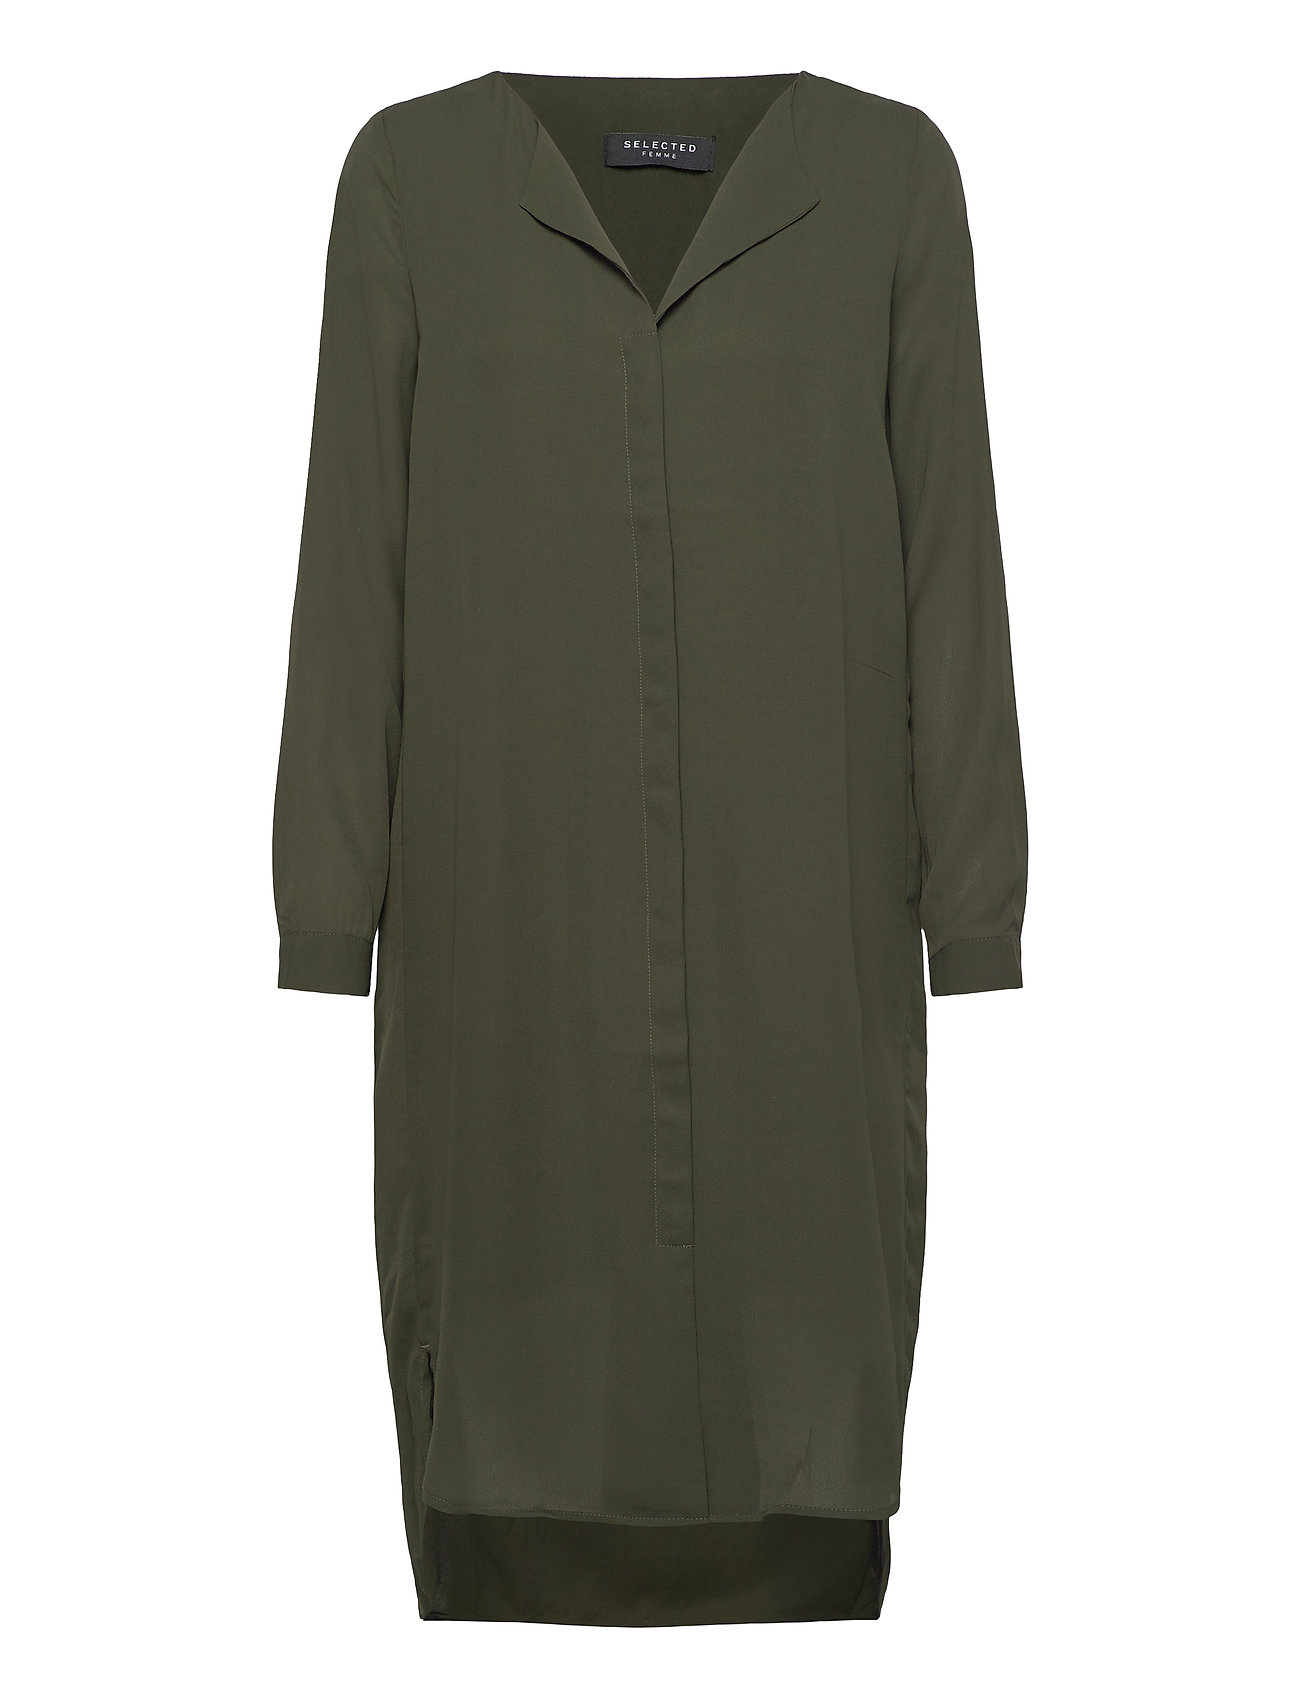 Selected Femme SLFDYNELLA LS DRESS B - ROSIN